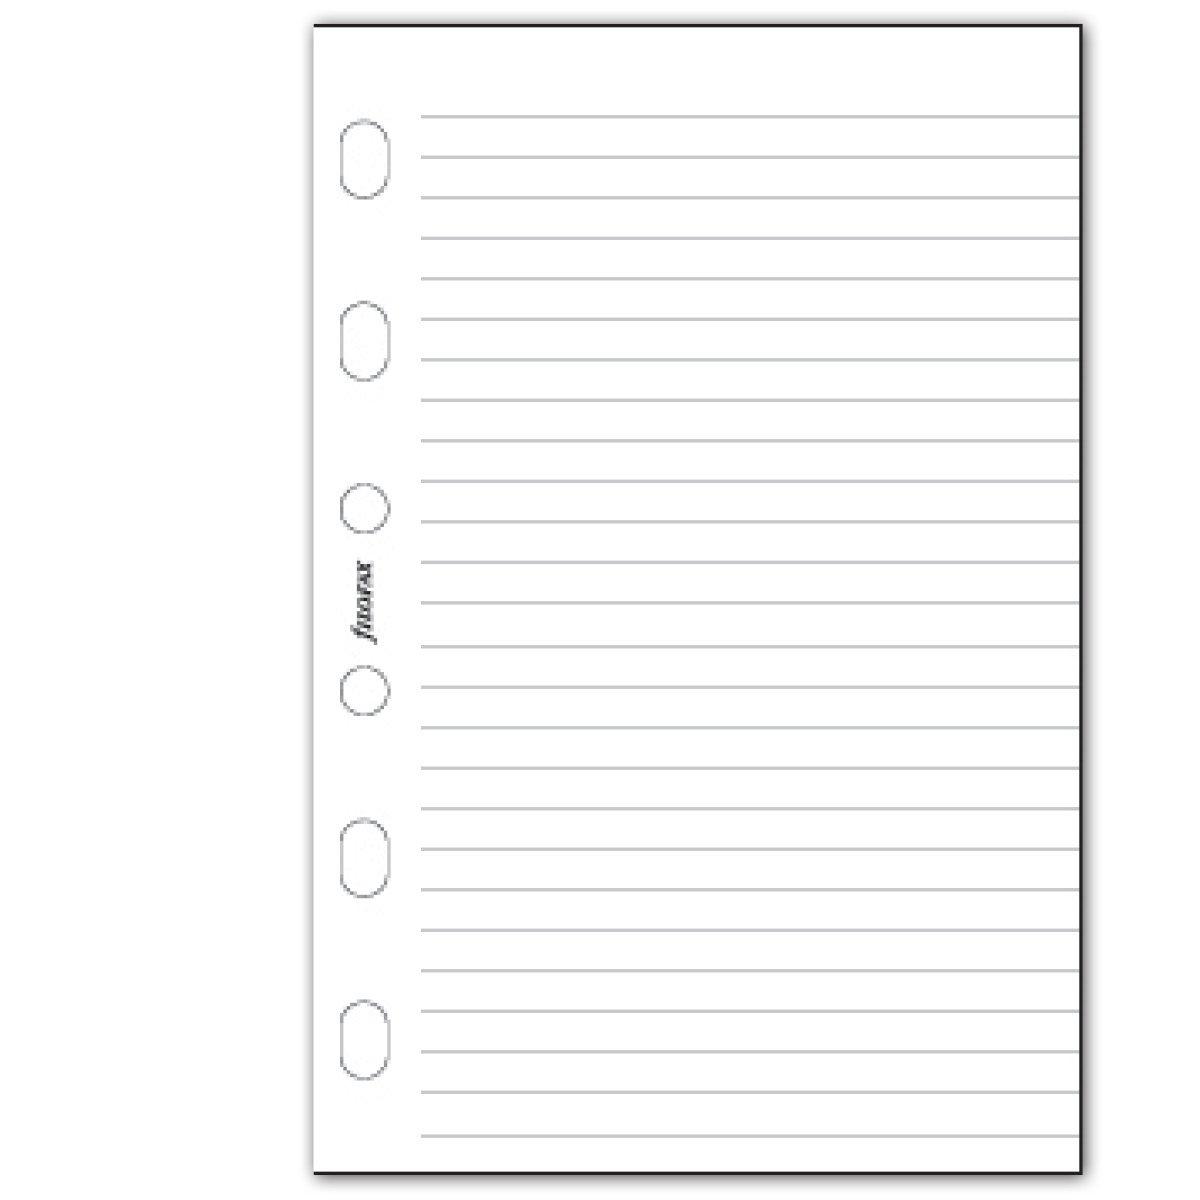 Filofax Pocket White Ruled Notepad